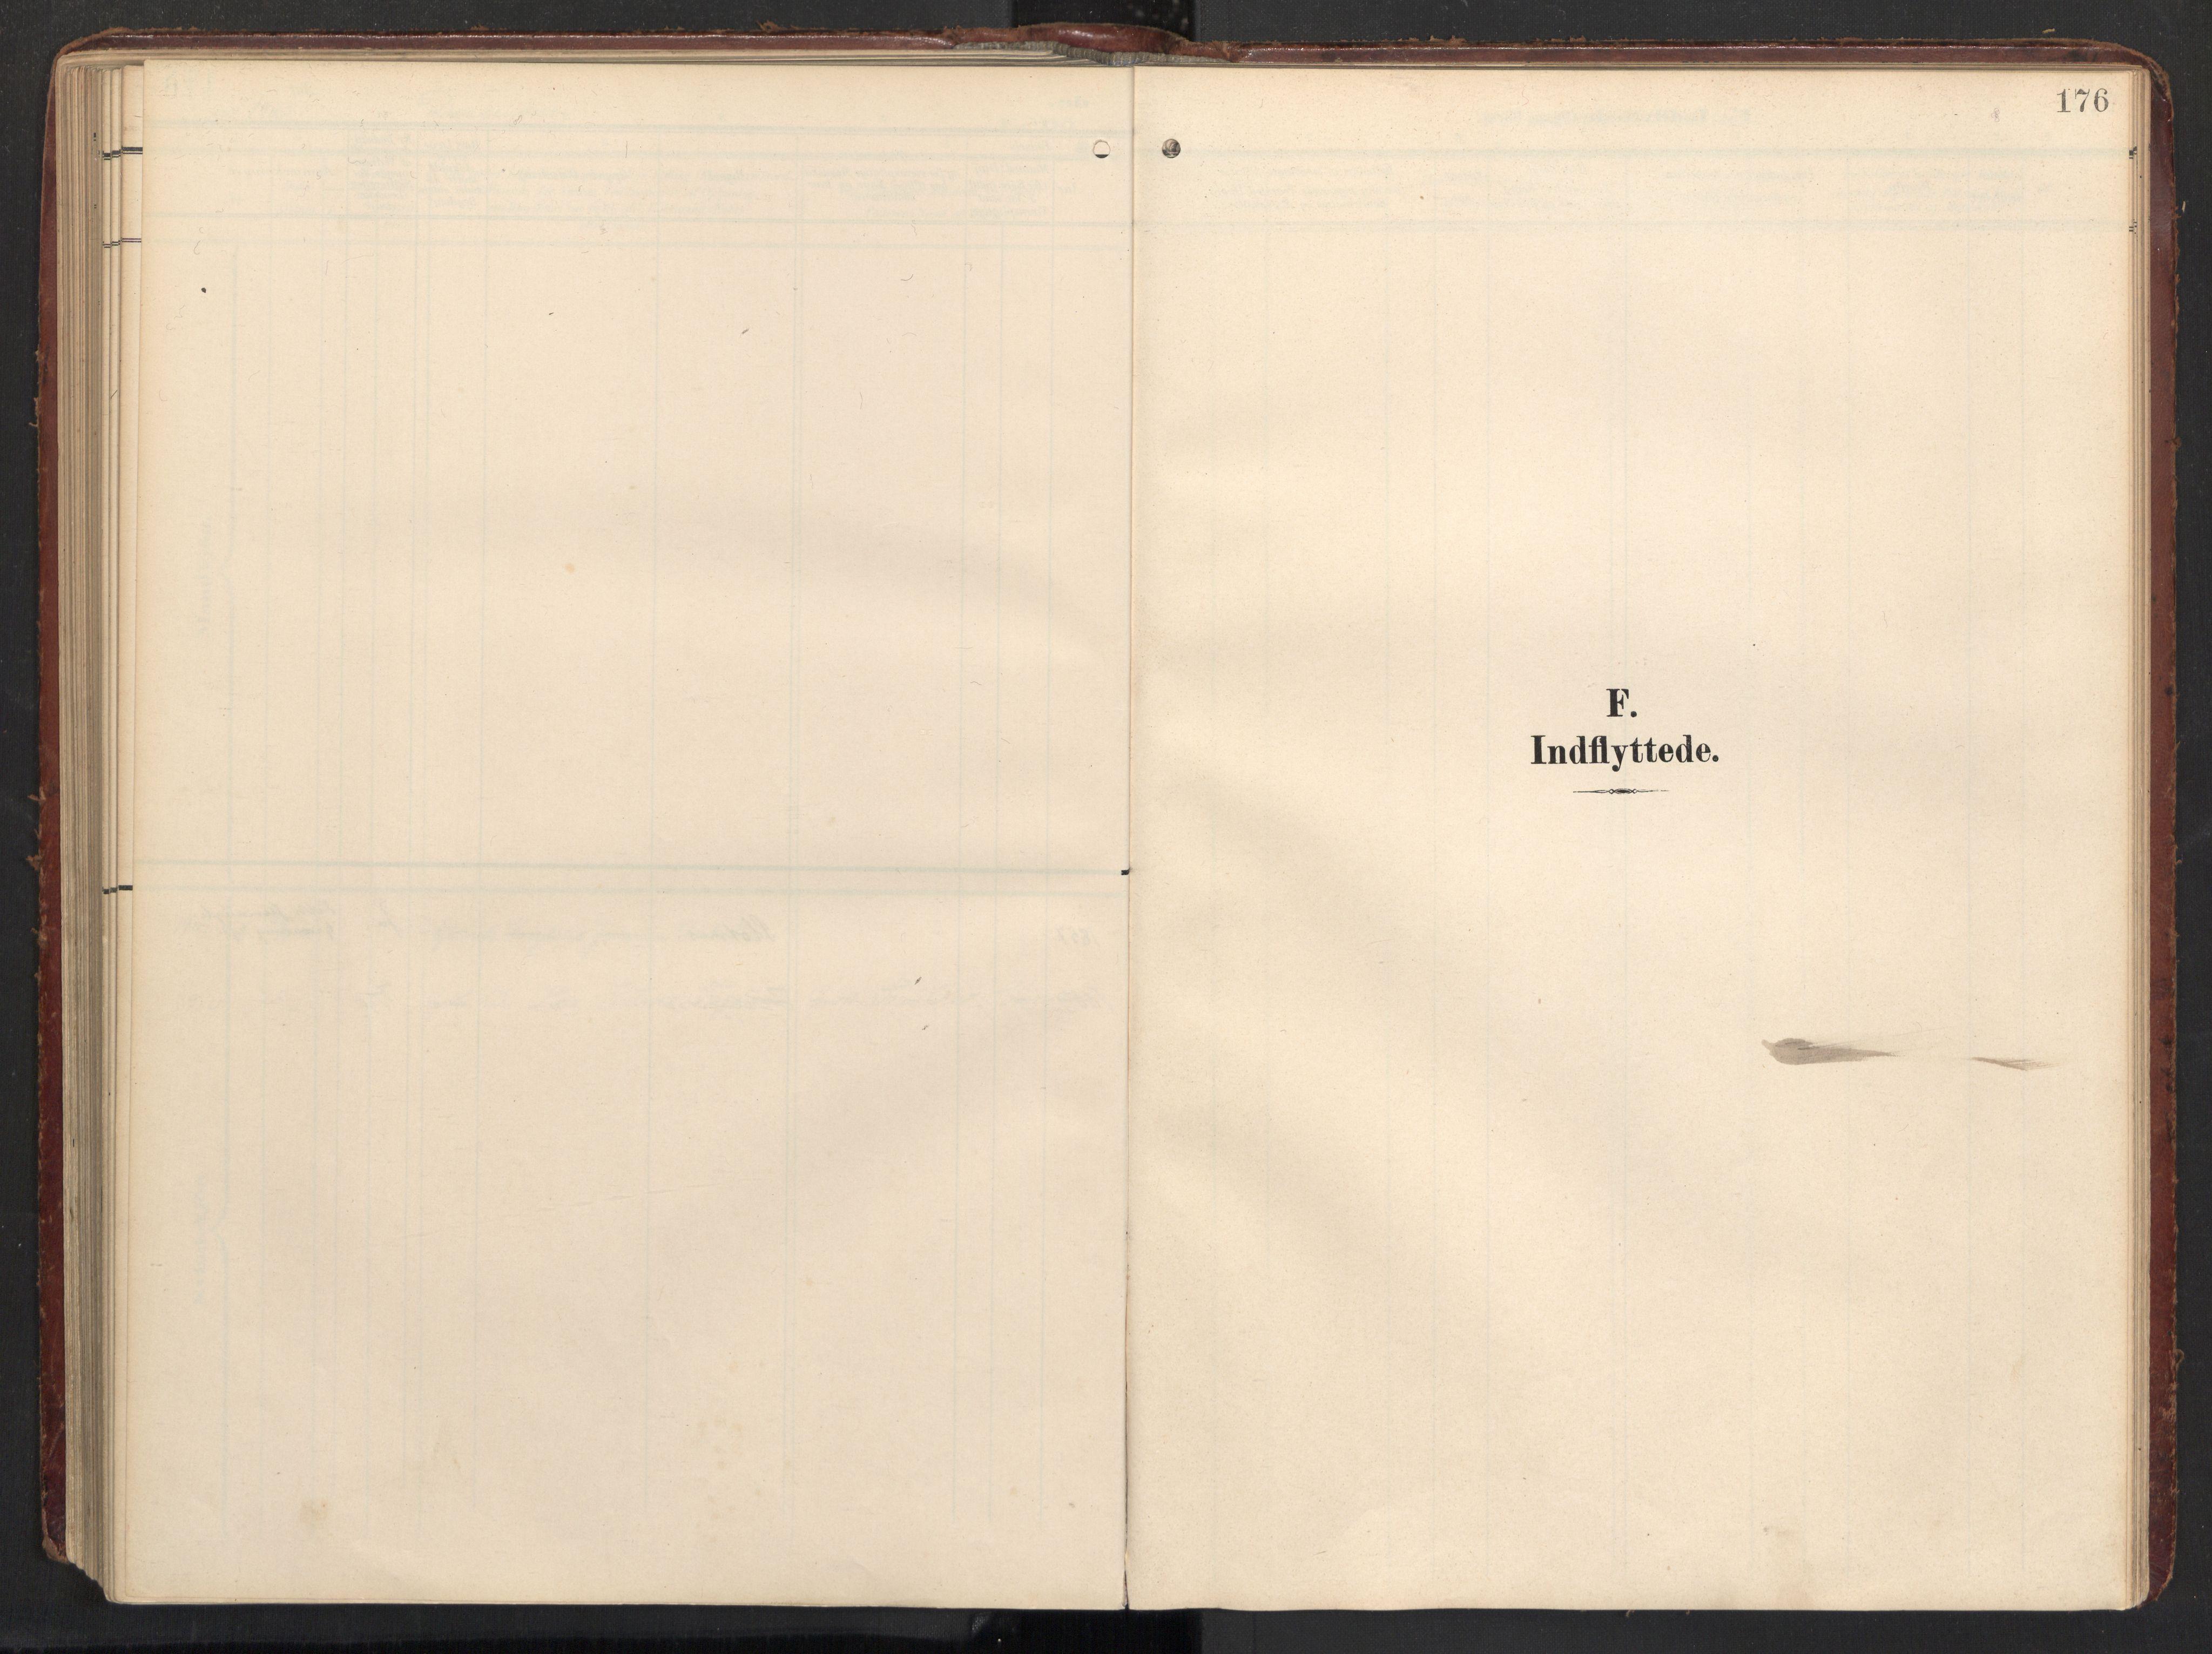 SAT, Ministerialprotokoller, klokkerbøker og fødselsregistre - Nordland, 890/L1287: Ministerialbok nr. 890A02, 1903-1915, s. 176